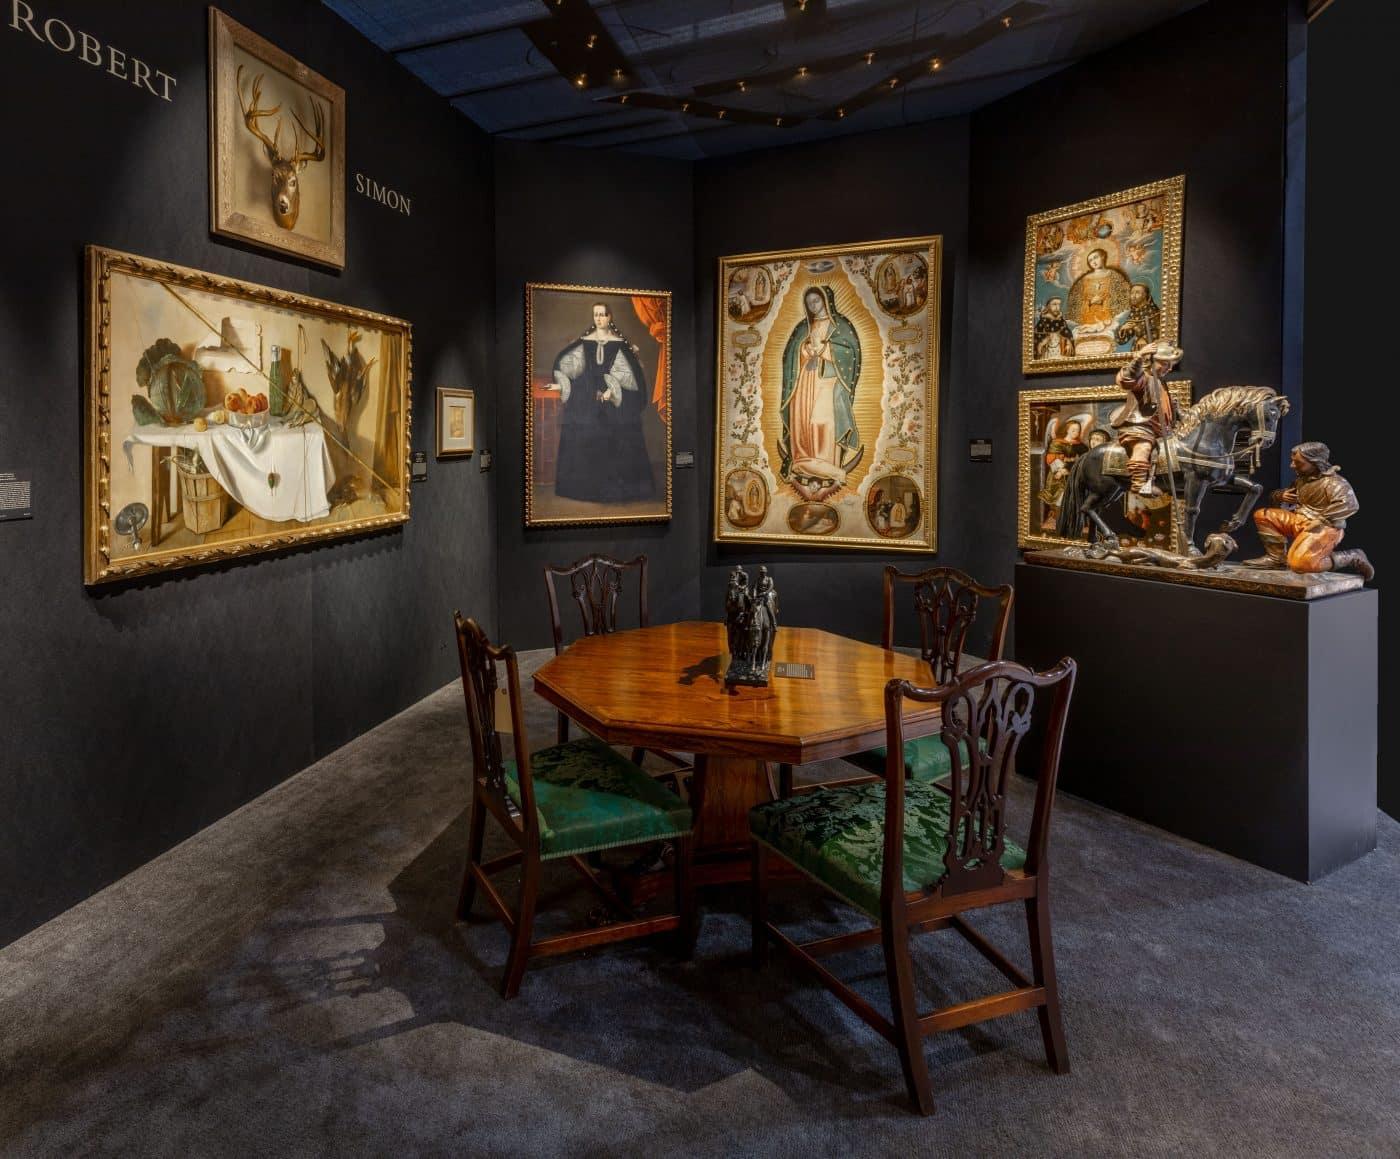 Robert Simon Fine Art's booth at the 2020 Winter Show